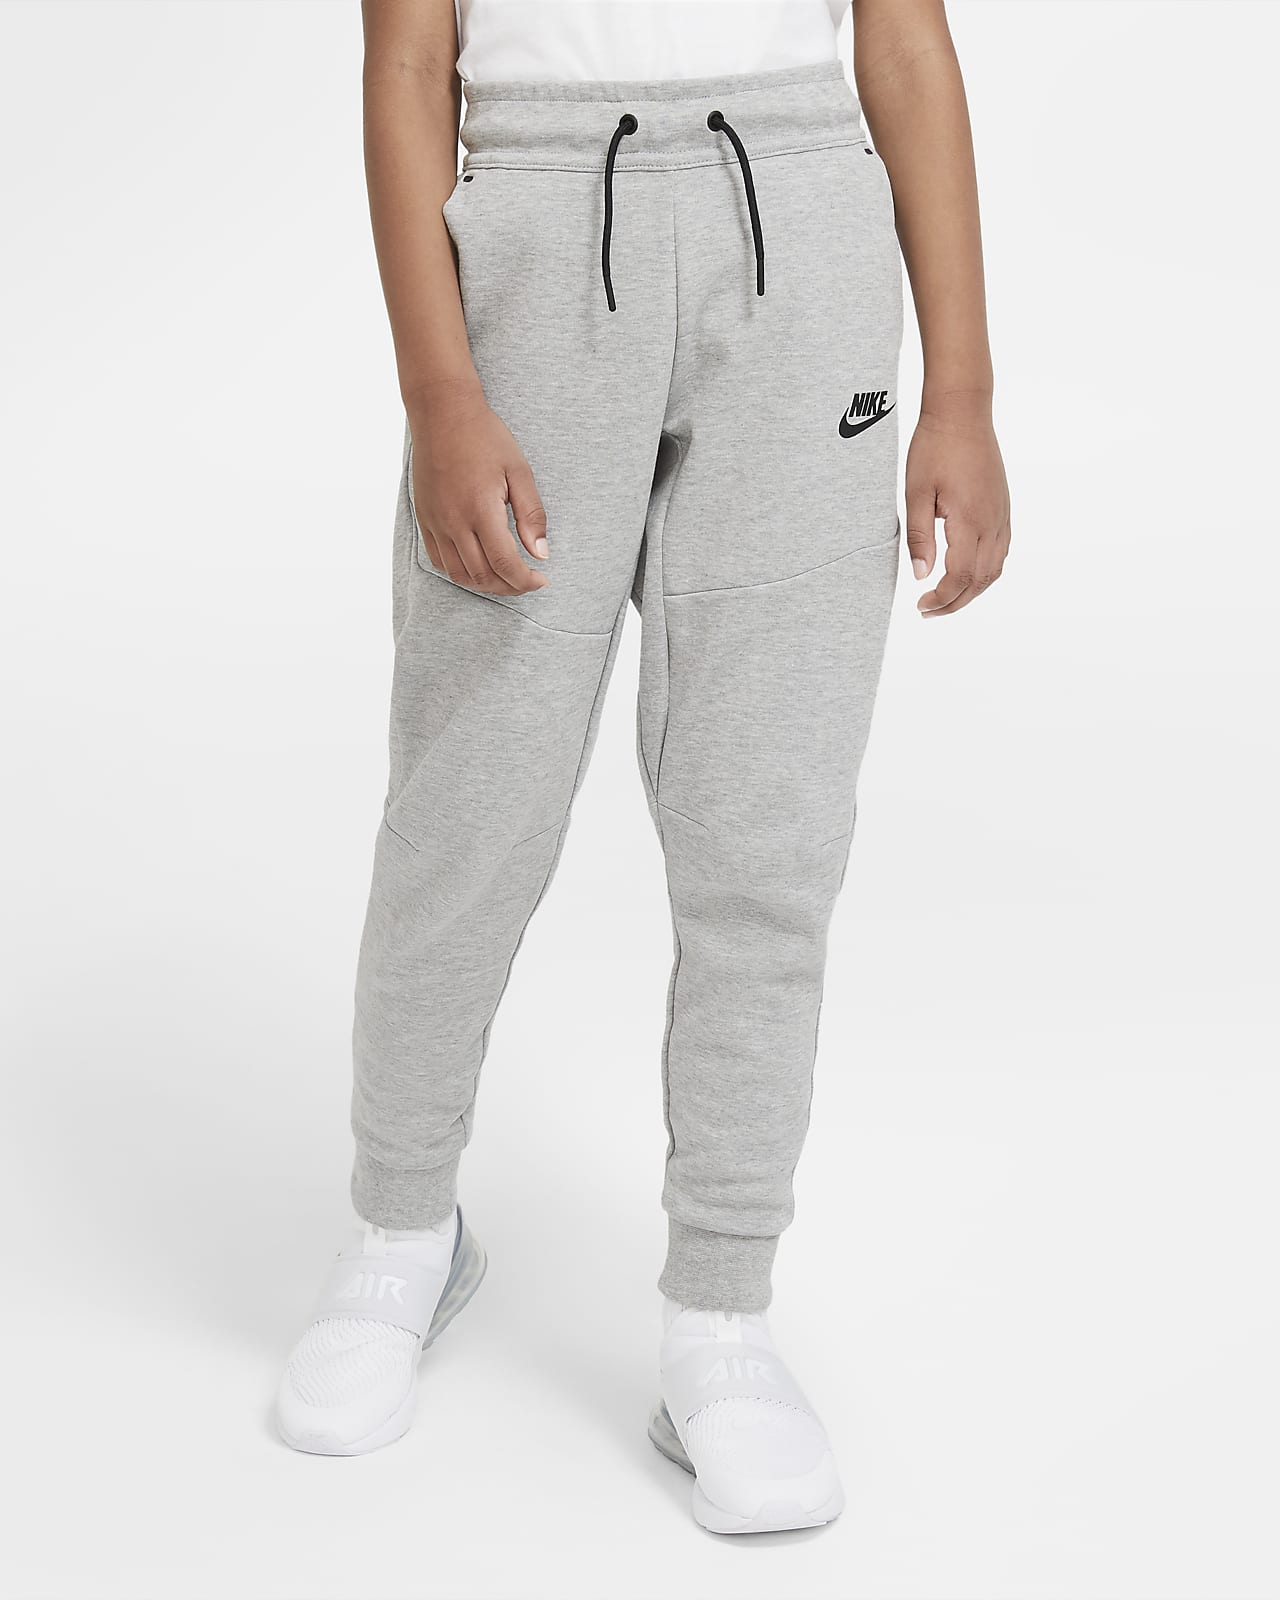 Pantaloni Nike Sportswear Tech Fleece - Ragazzo